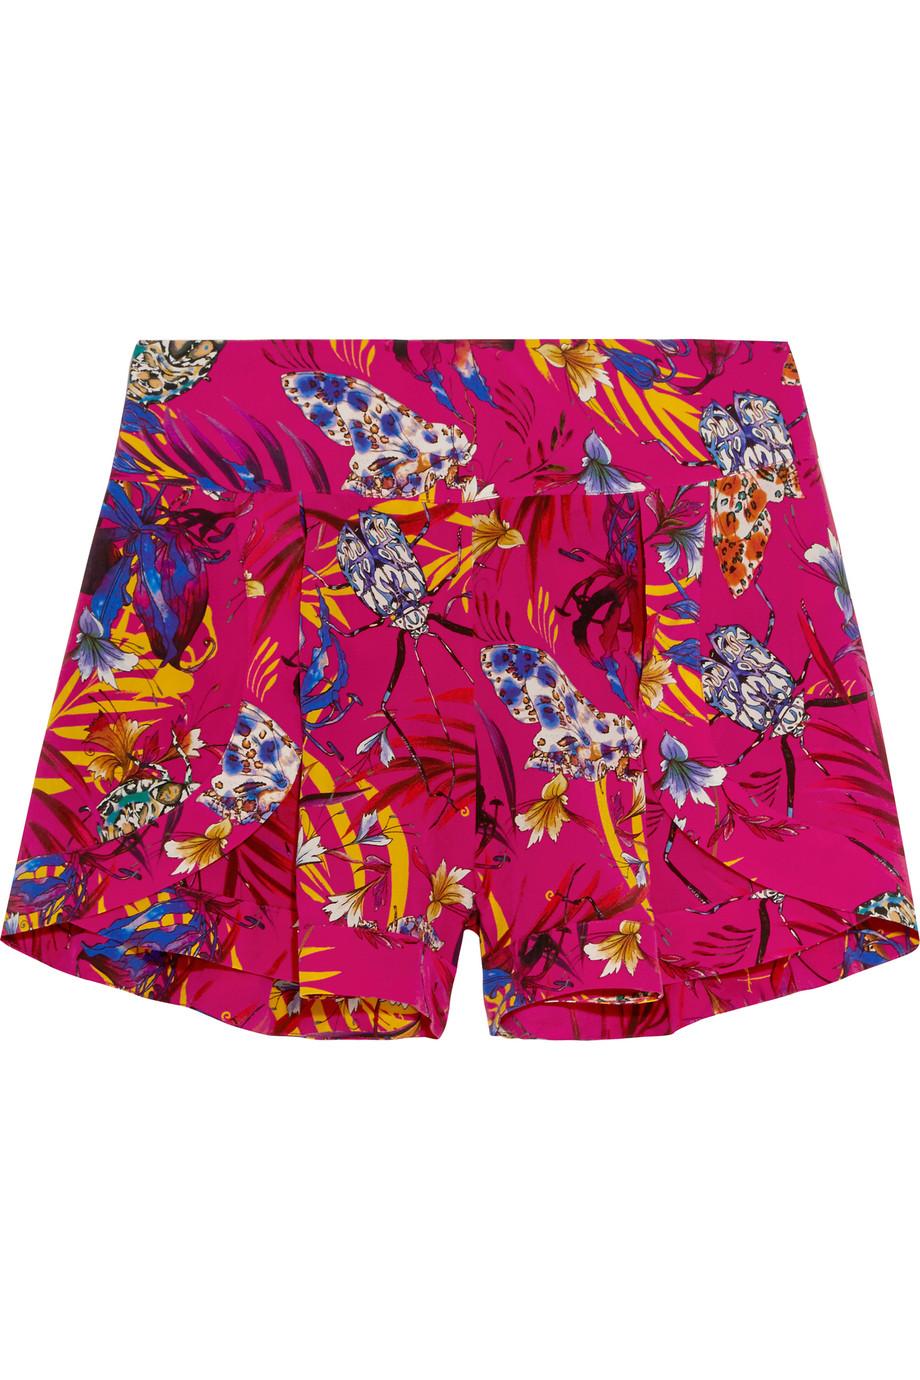 Printed Washed-Silk Shorts, Matthew Williamson, Bright Pink, Women's, Size: 8